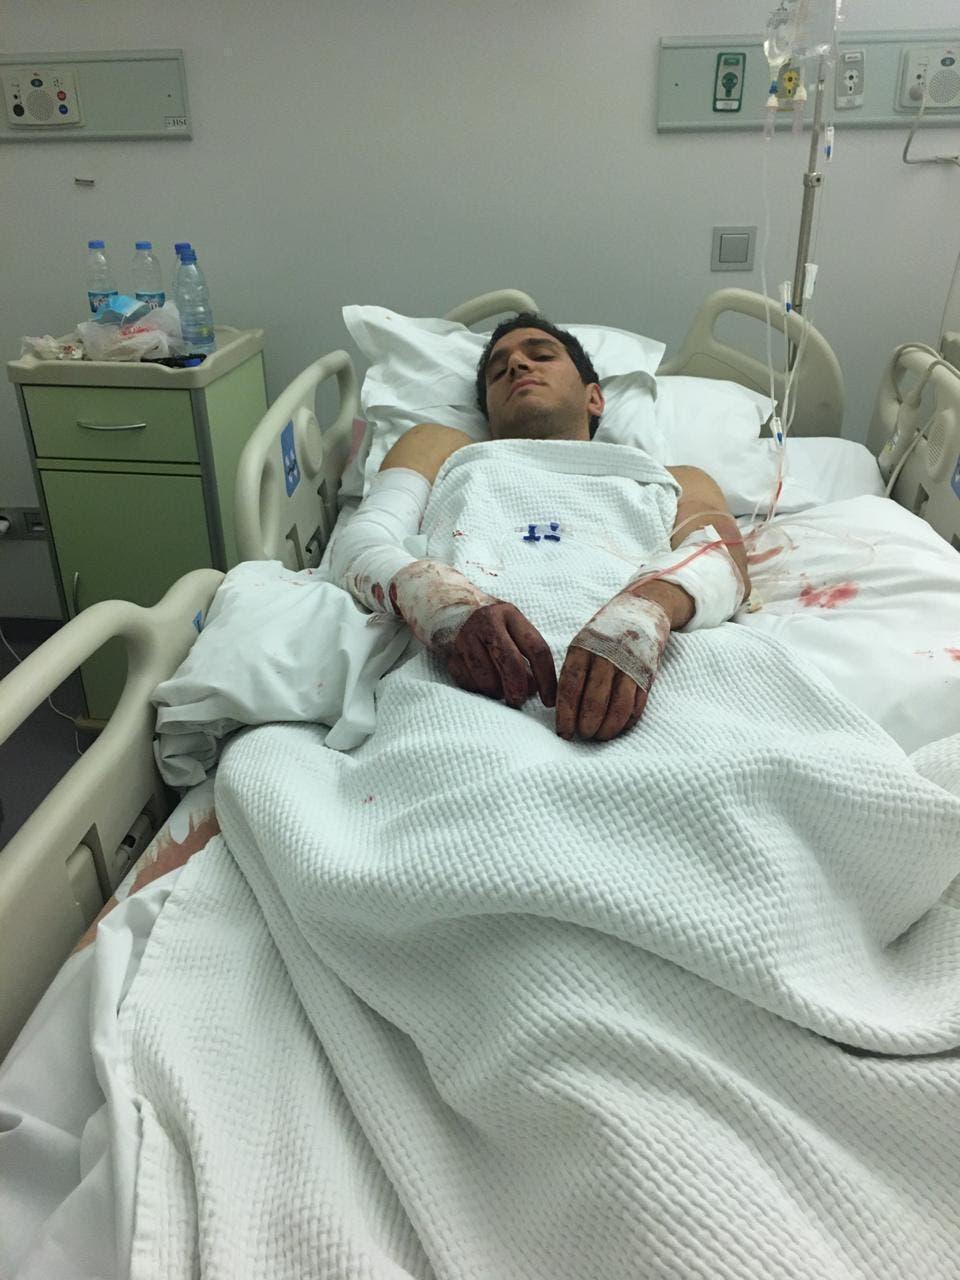 Antonio Merheb at Rizk Hospital on August 5, 2020. (Credit: Antonio Merheb)